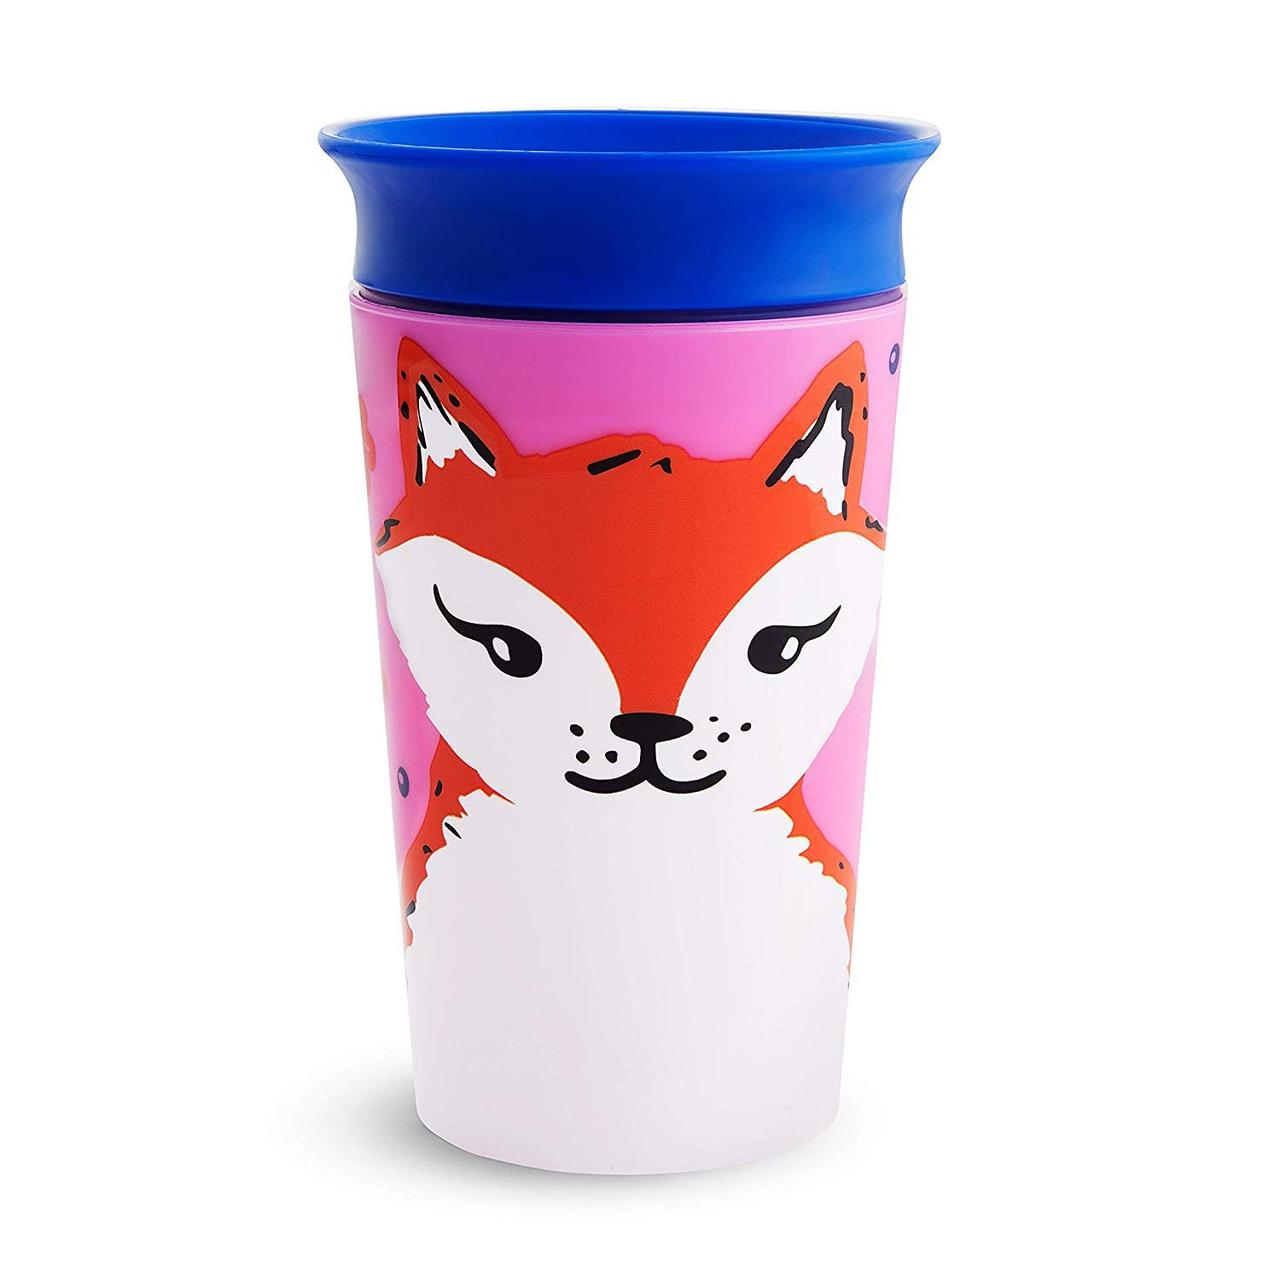 Чашка непроливная Munchkin Miracle 360 WildLove, 266 мл